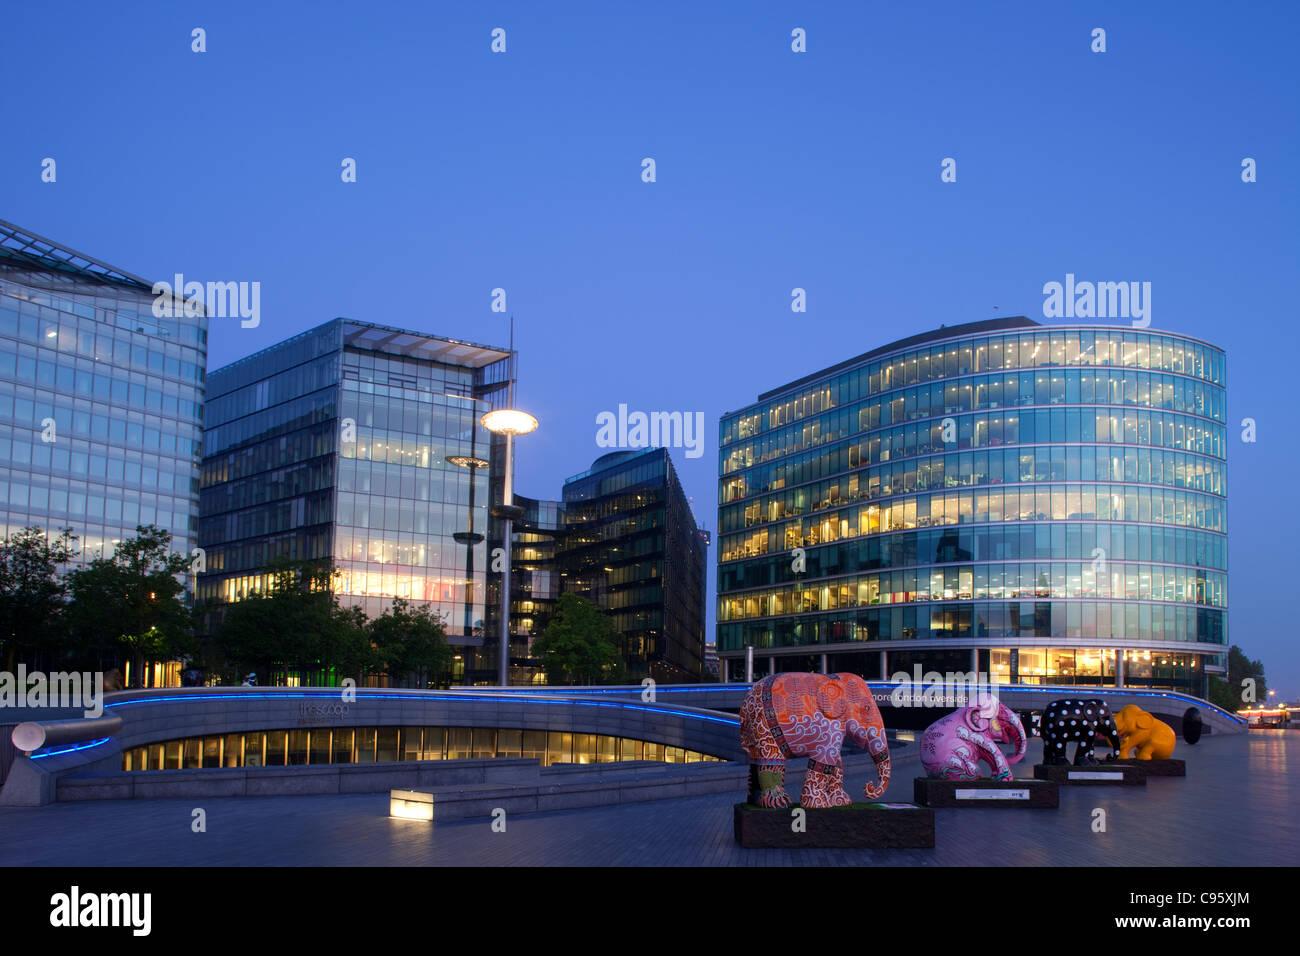 England, London, Southwark, Office Buildings in the More London Riverside Development - Stock Image